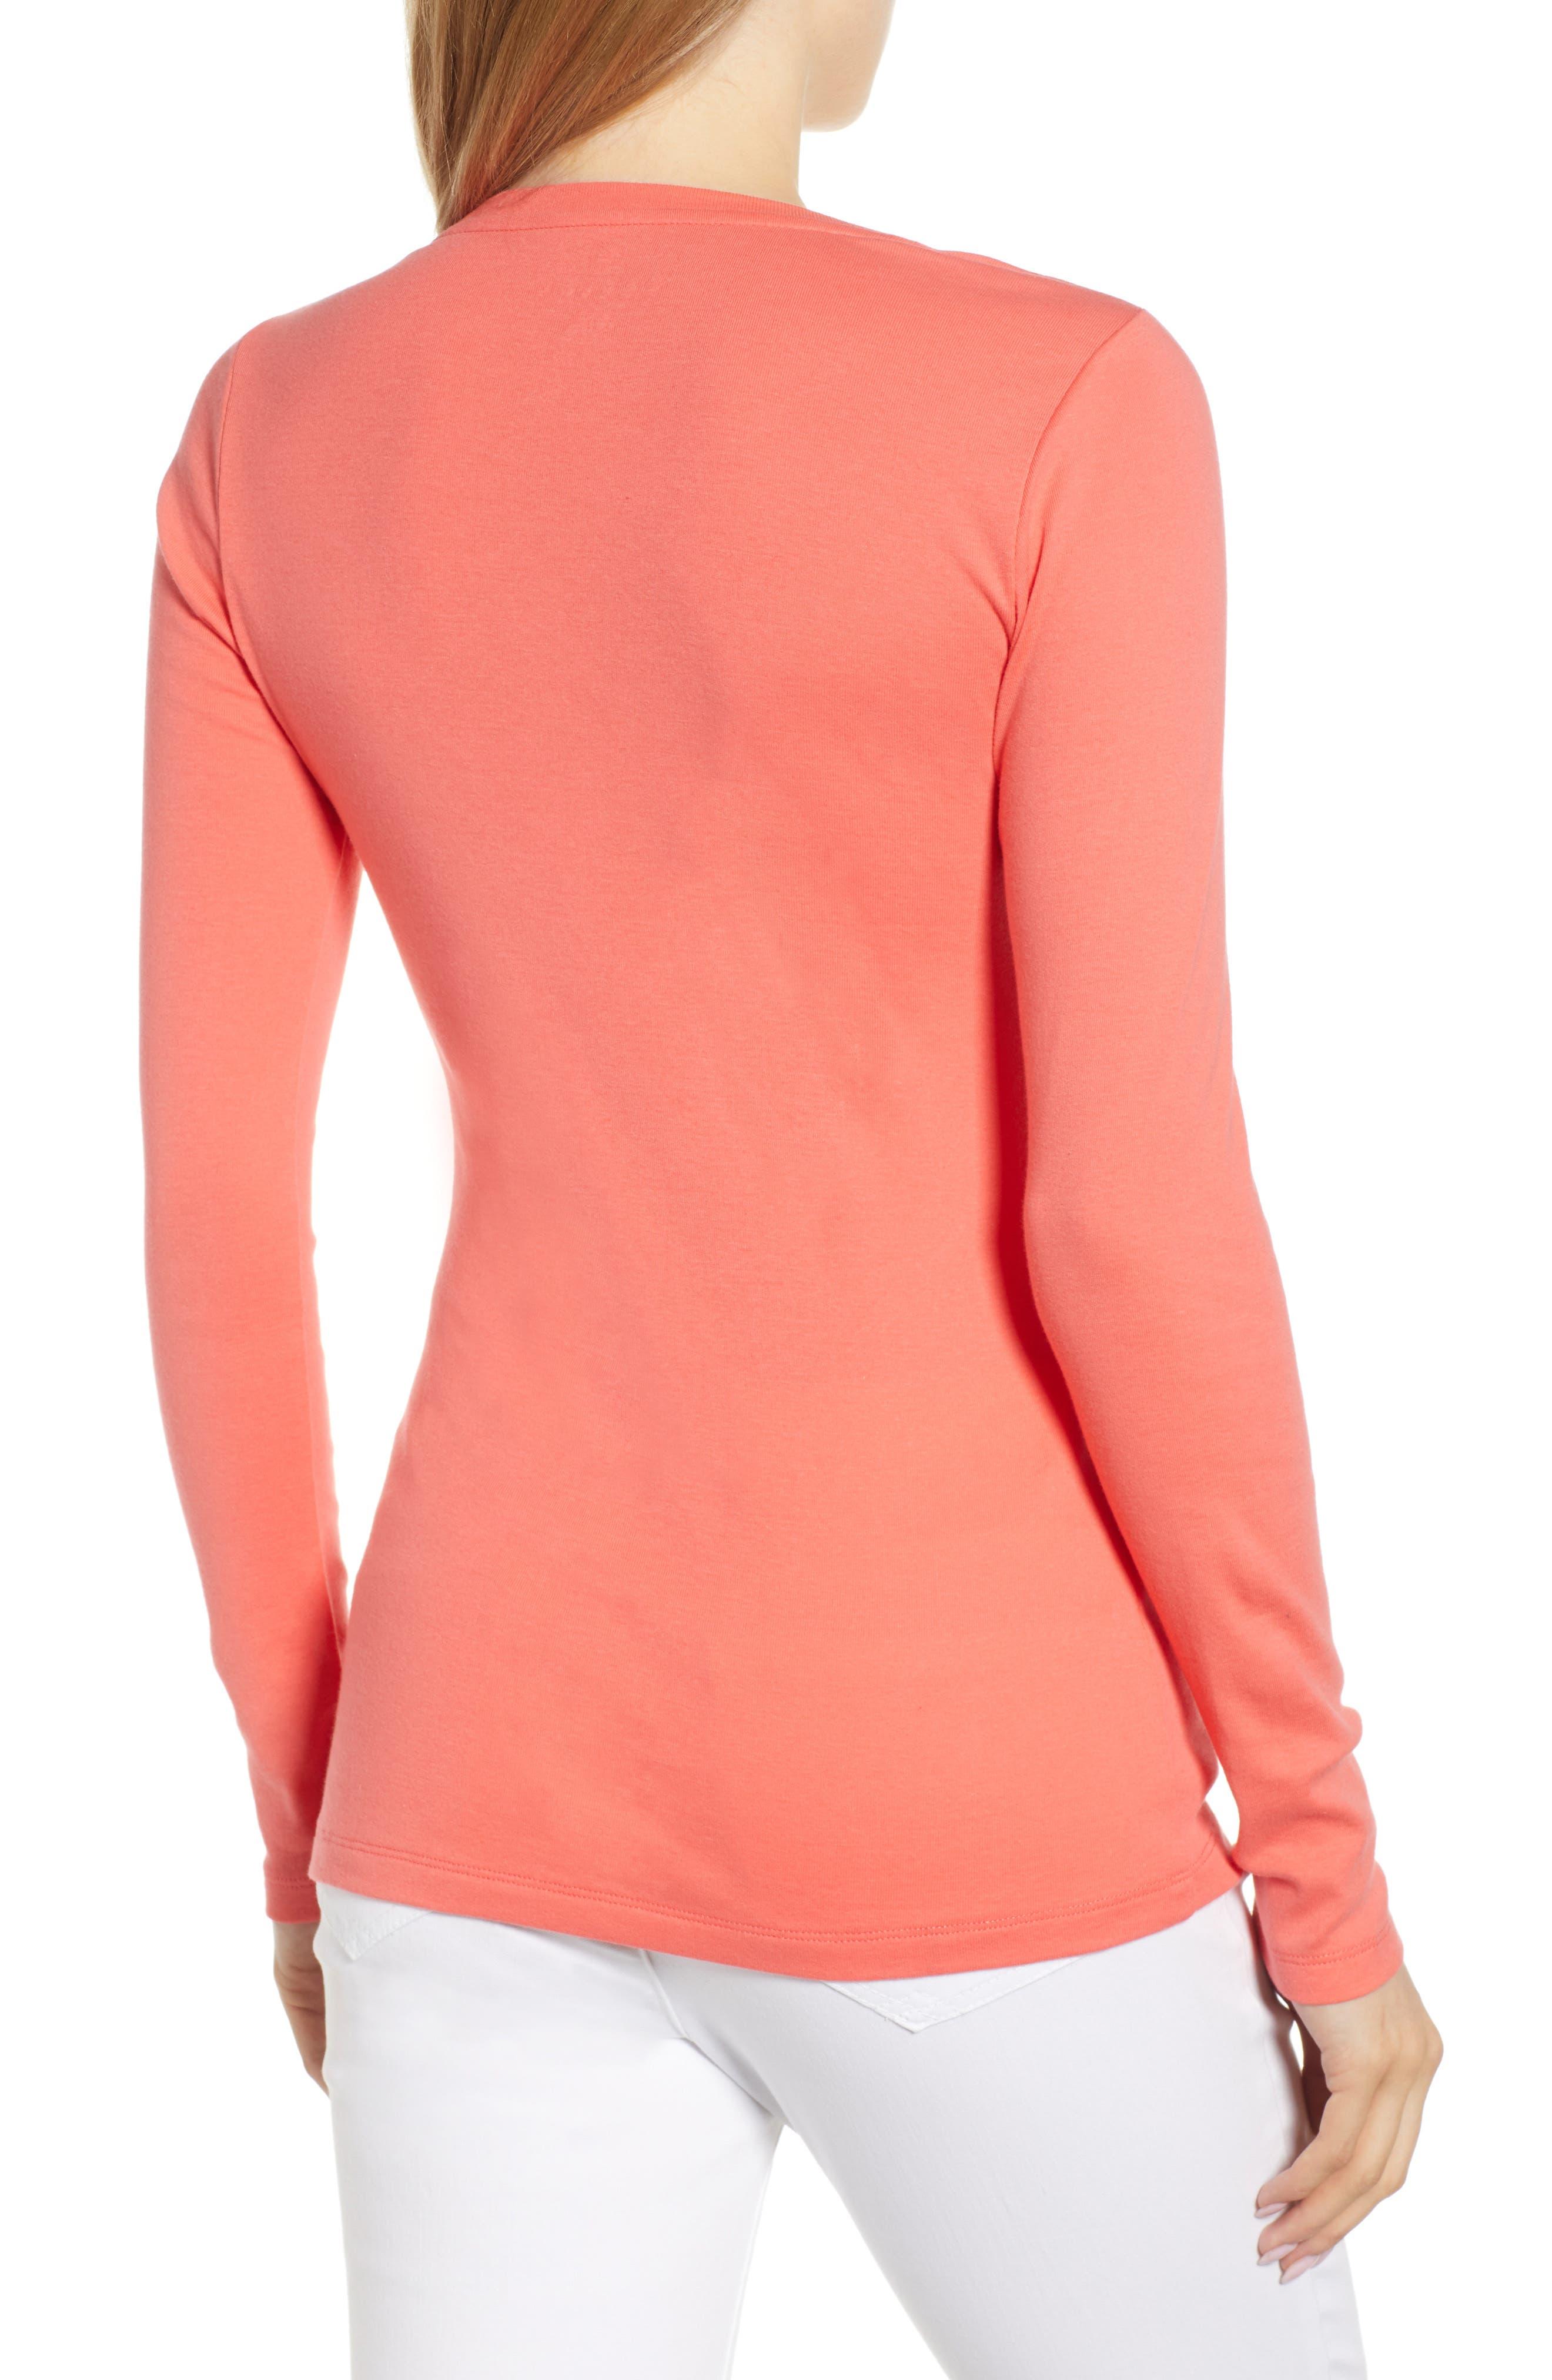 Womens Orange Tops Nordstrom